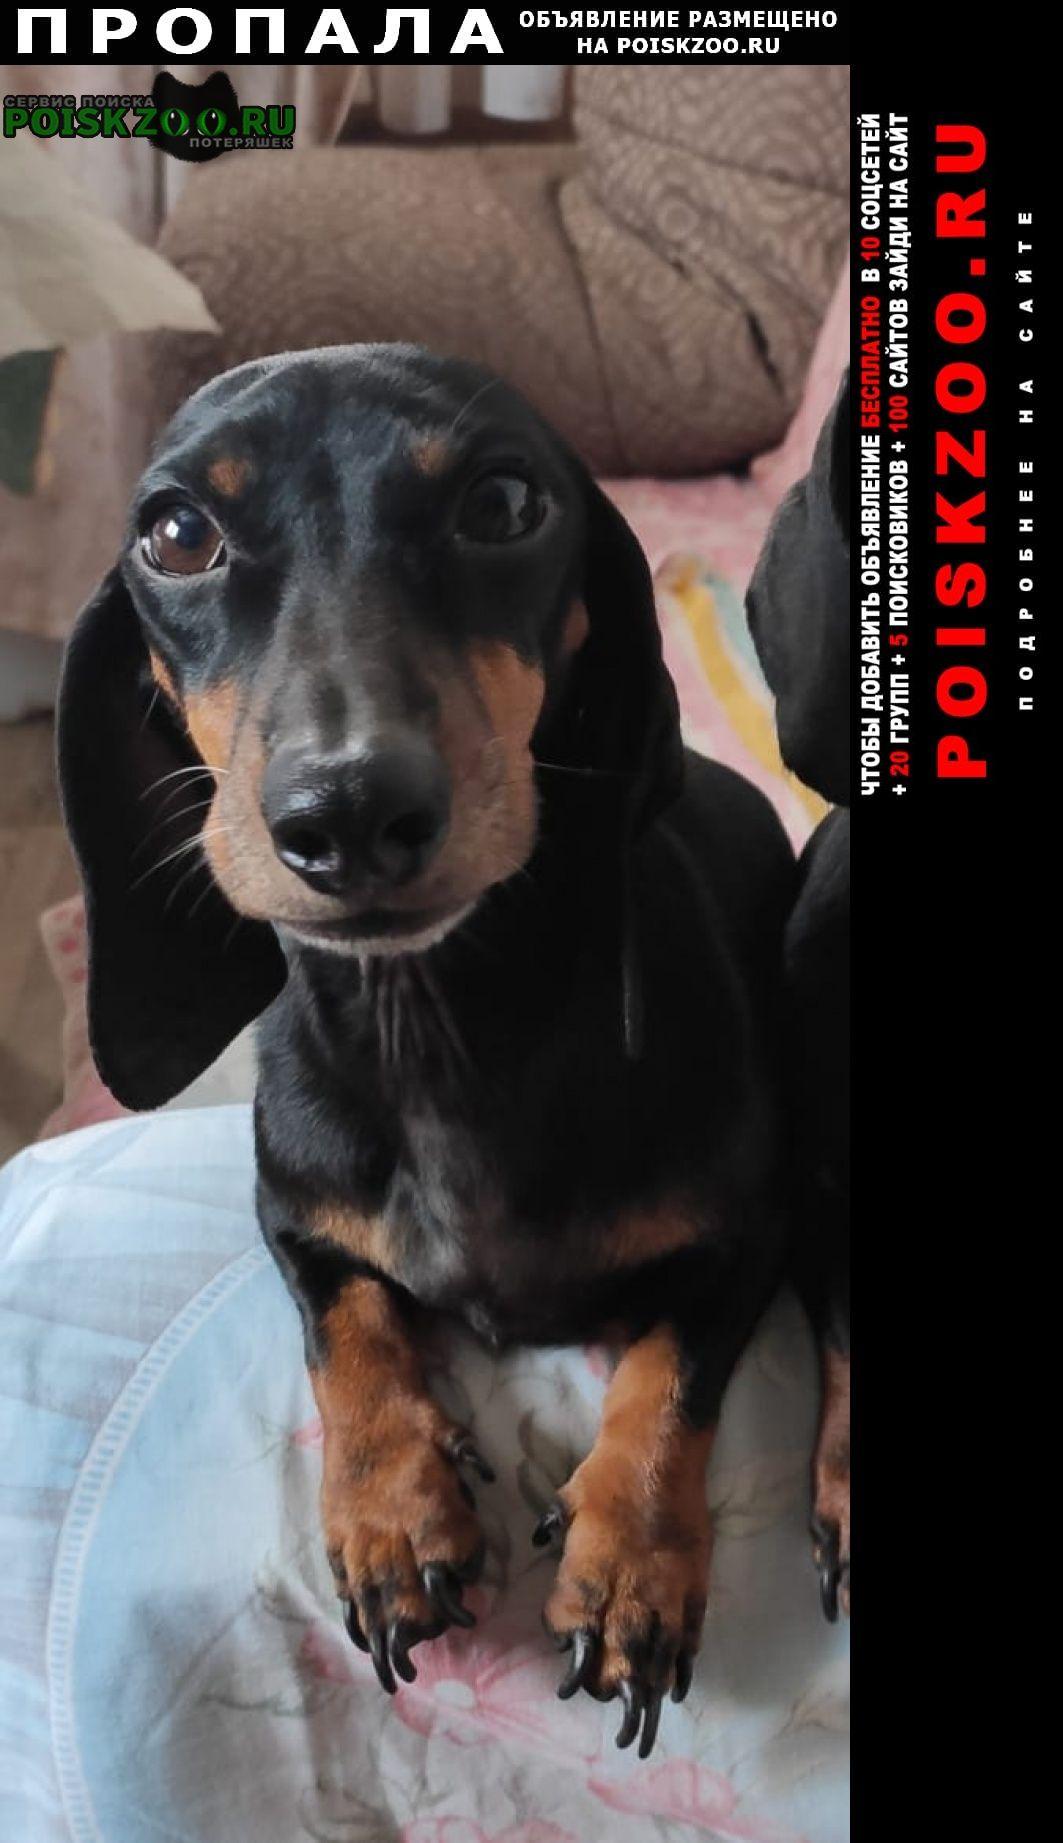 Пропала собака кобель такса Москва